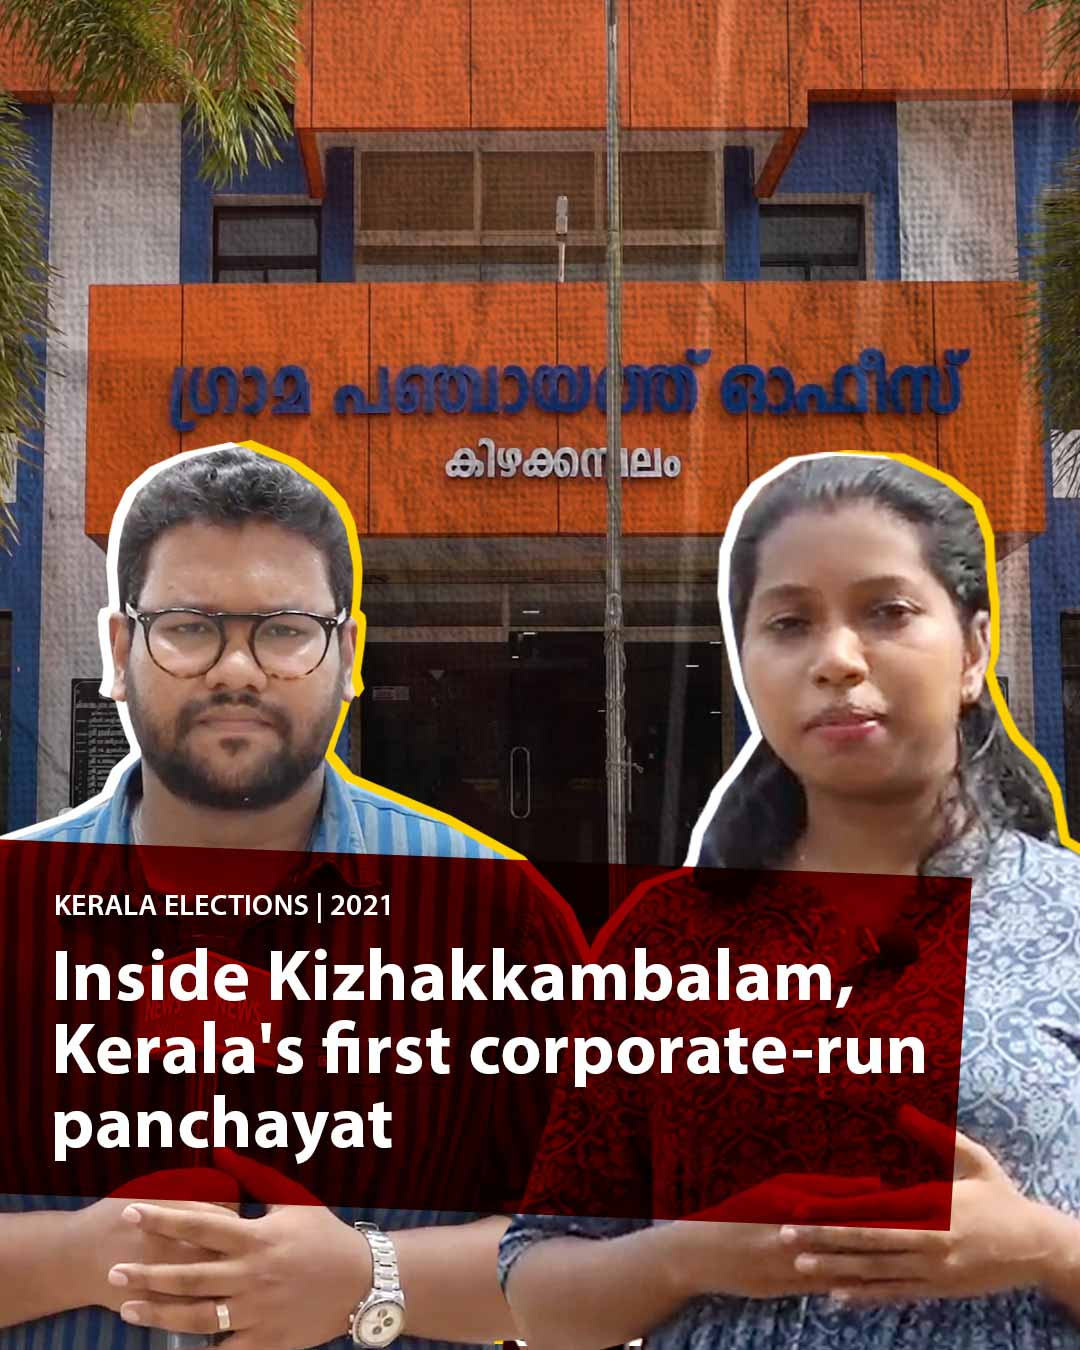 How Kizhakkambalam Twenty 20, a corporate group, assumed power in 4 Kerala panchayats